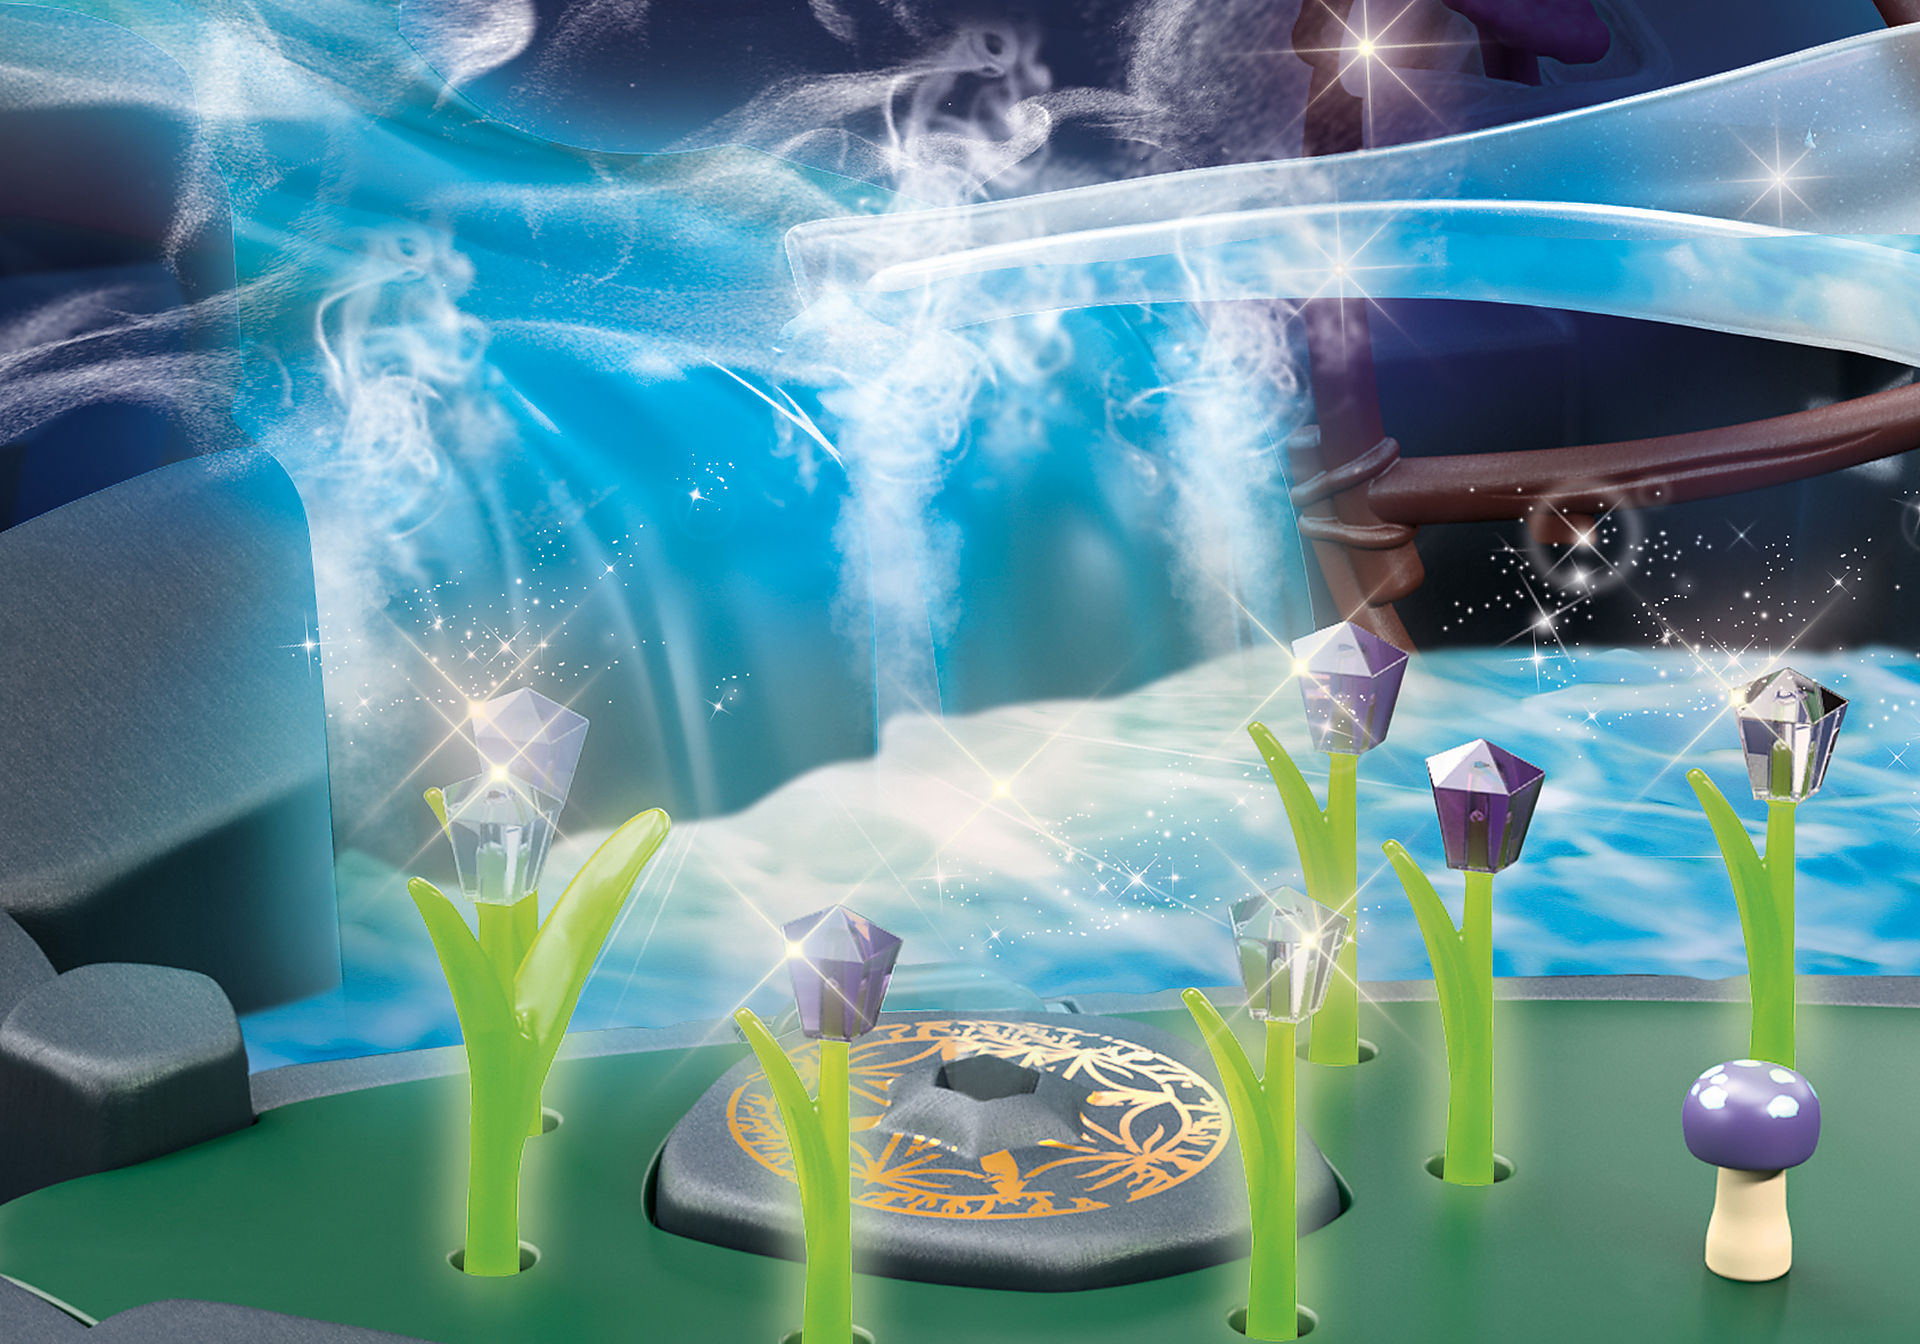 70800 Magical Energy Source zoom image8